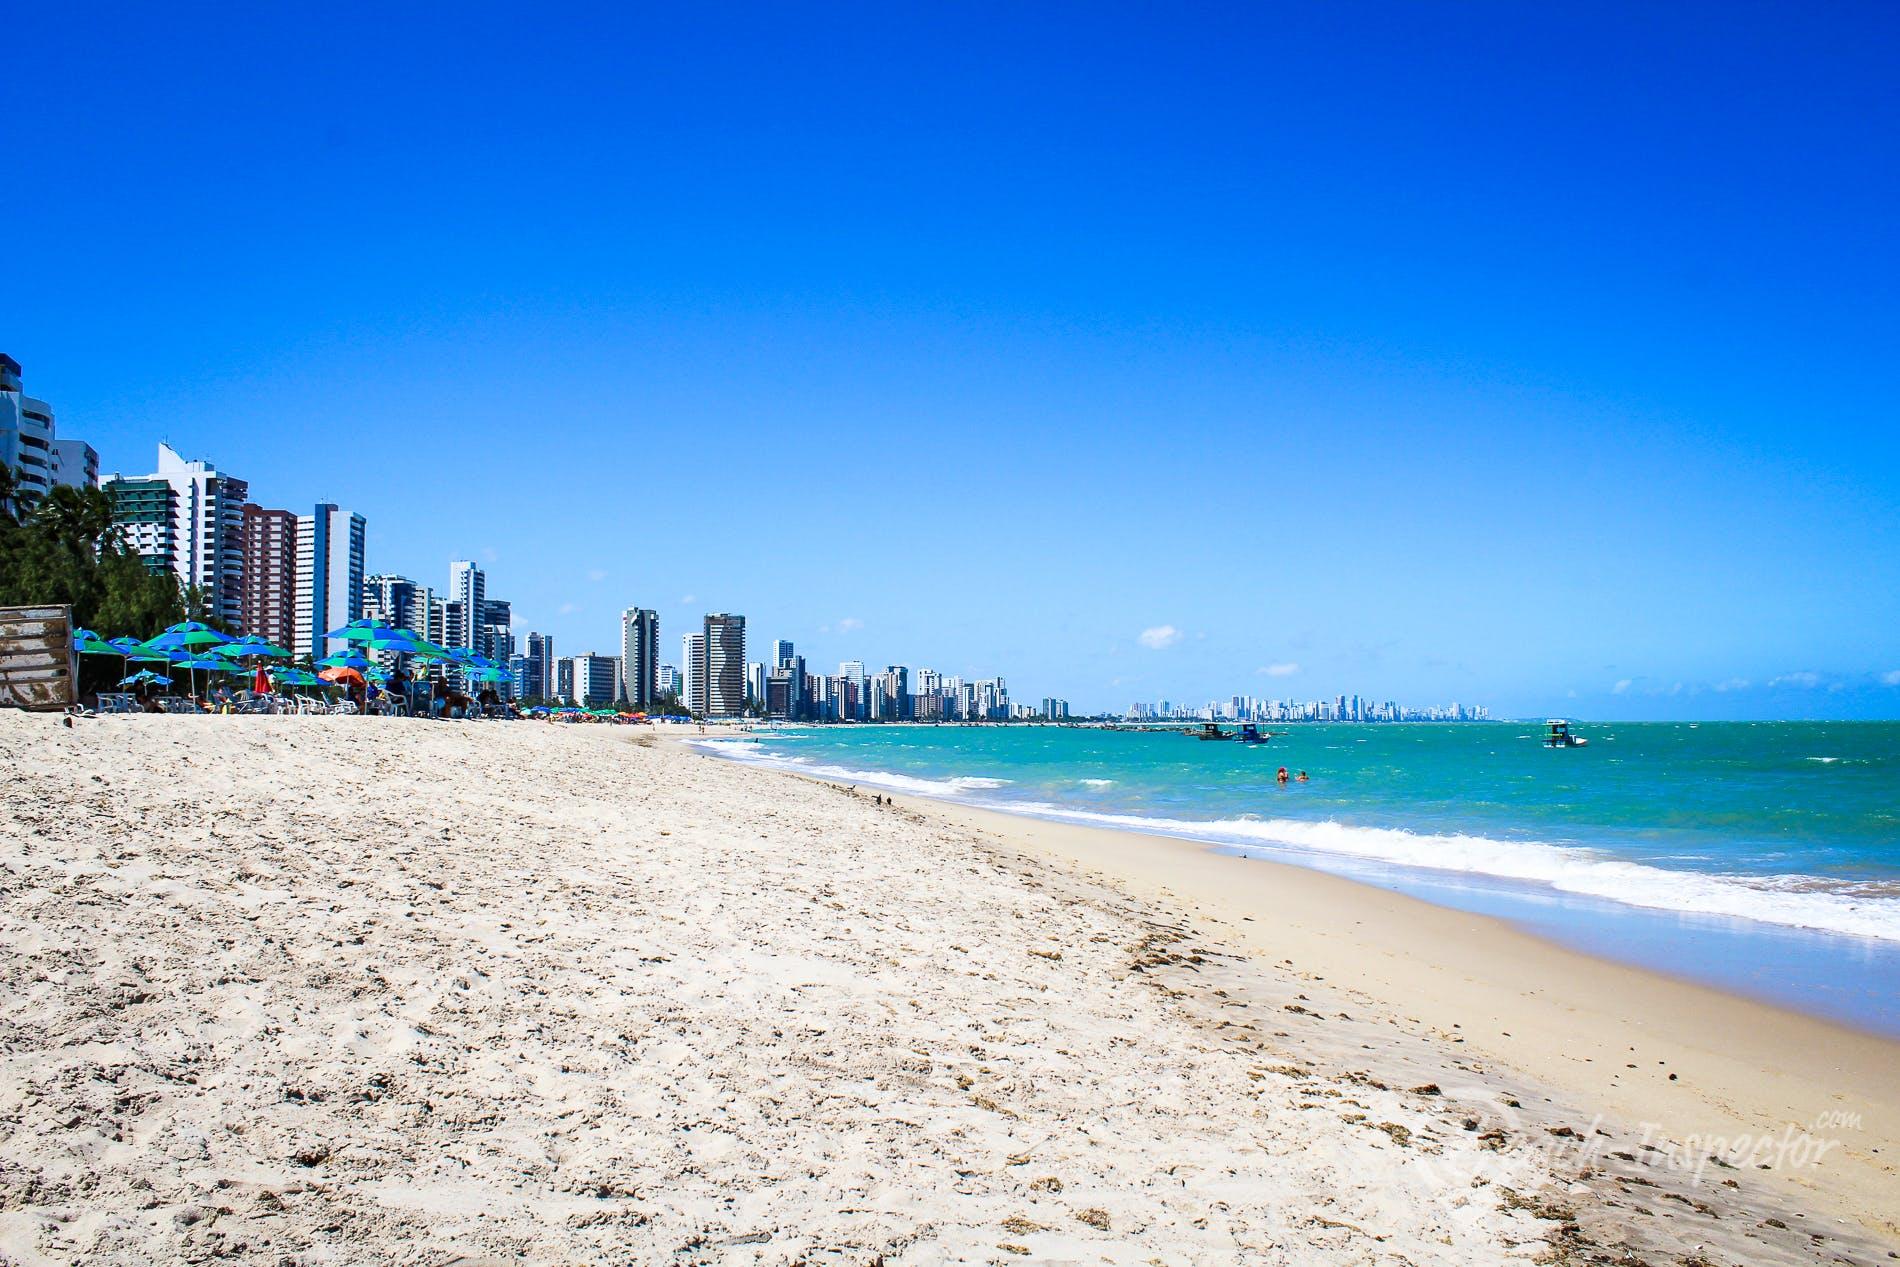 Strand Praia de Candeias, Pernambuco, Brasilien